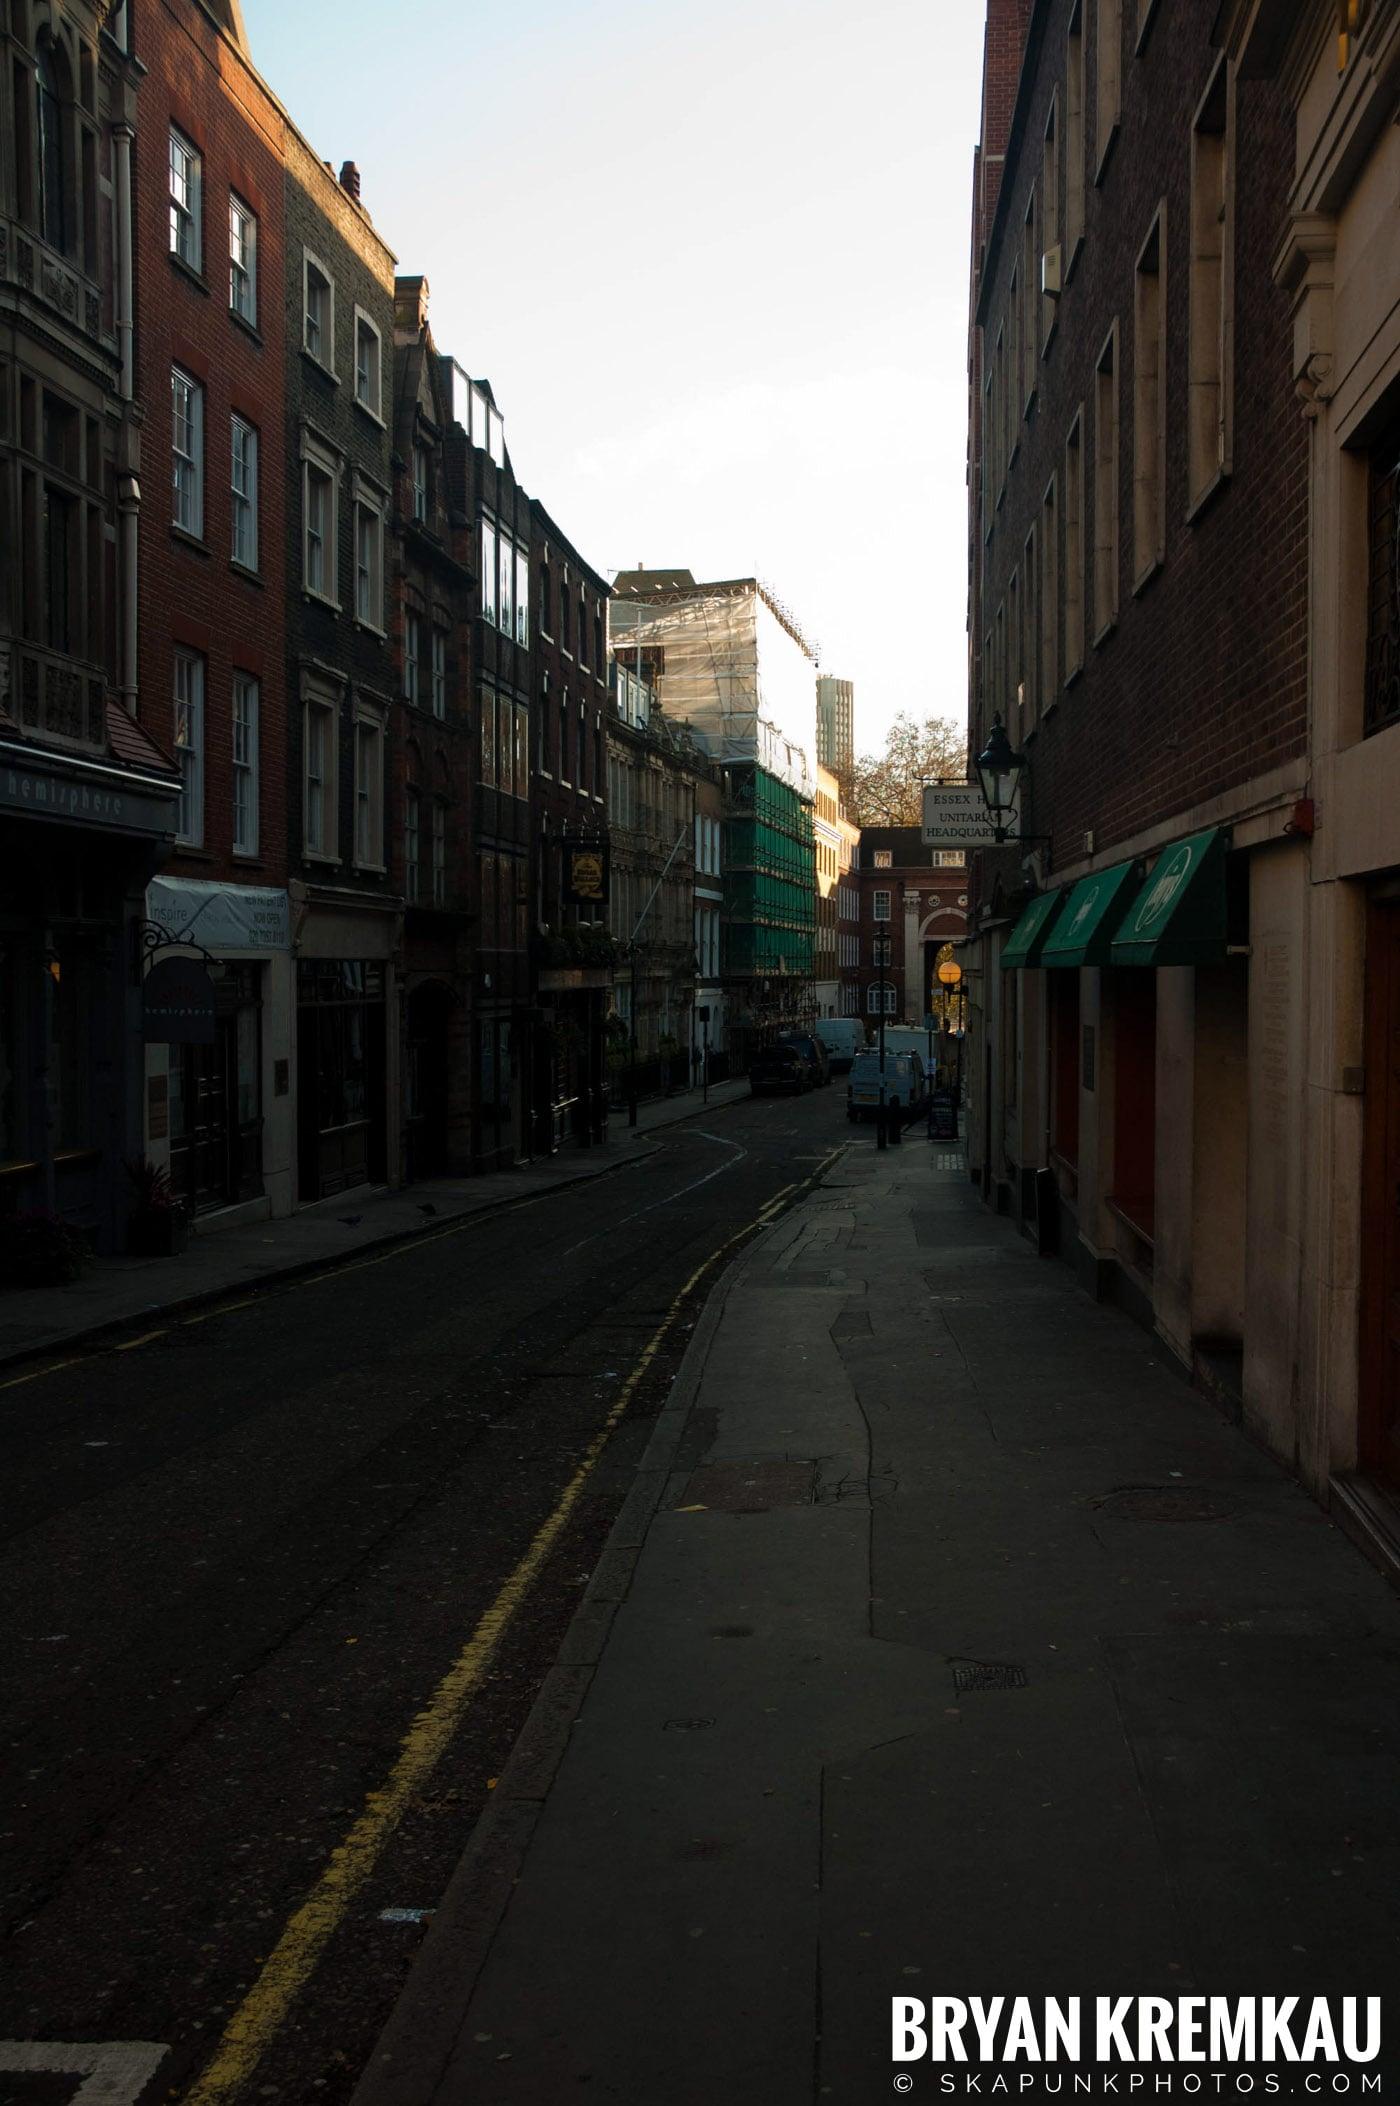 London, England - Day 2 - 12.9.06 (16)